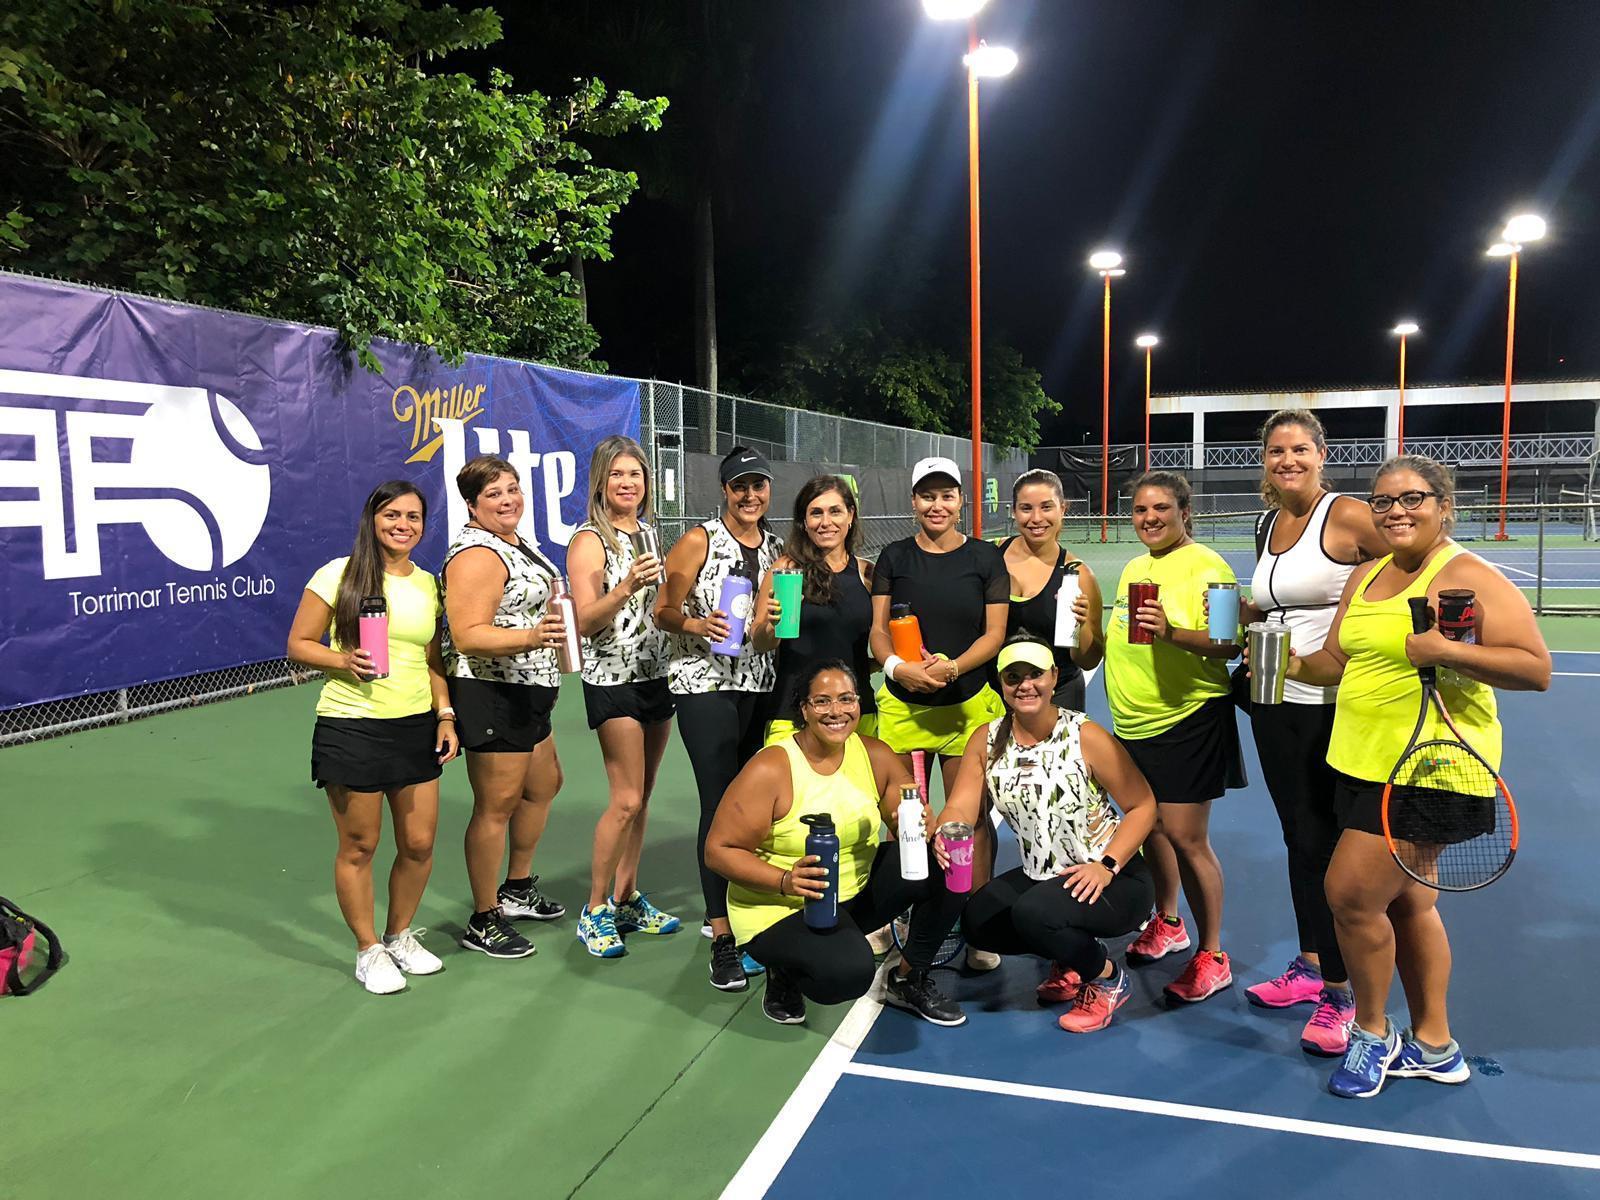 Equipo femenino 3.0 Torrimar Anel Alejandro